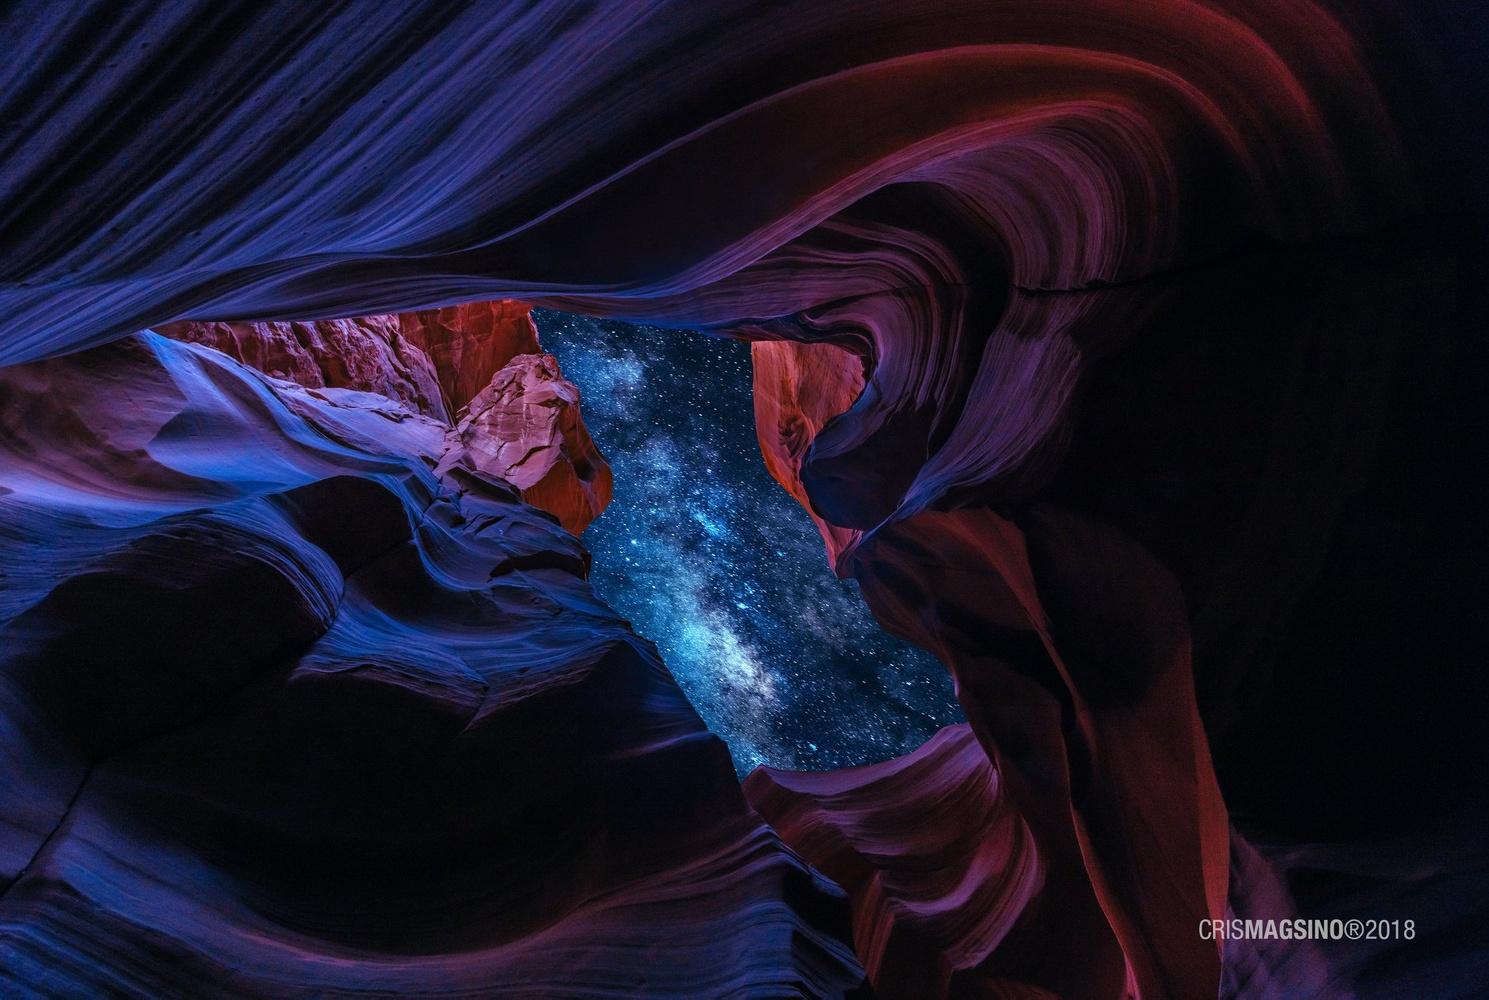 Cosmic Eye by Cris Magsino